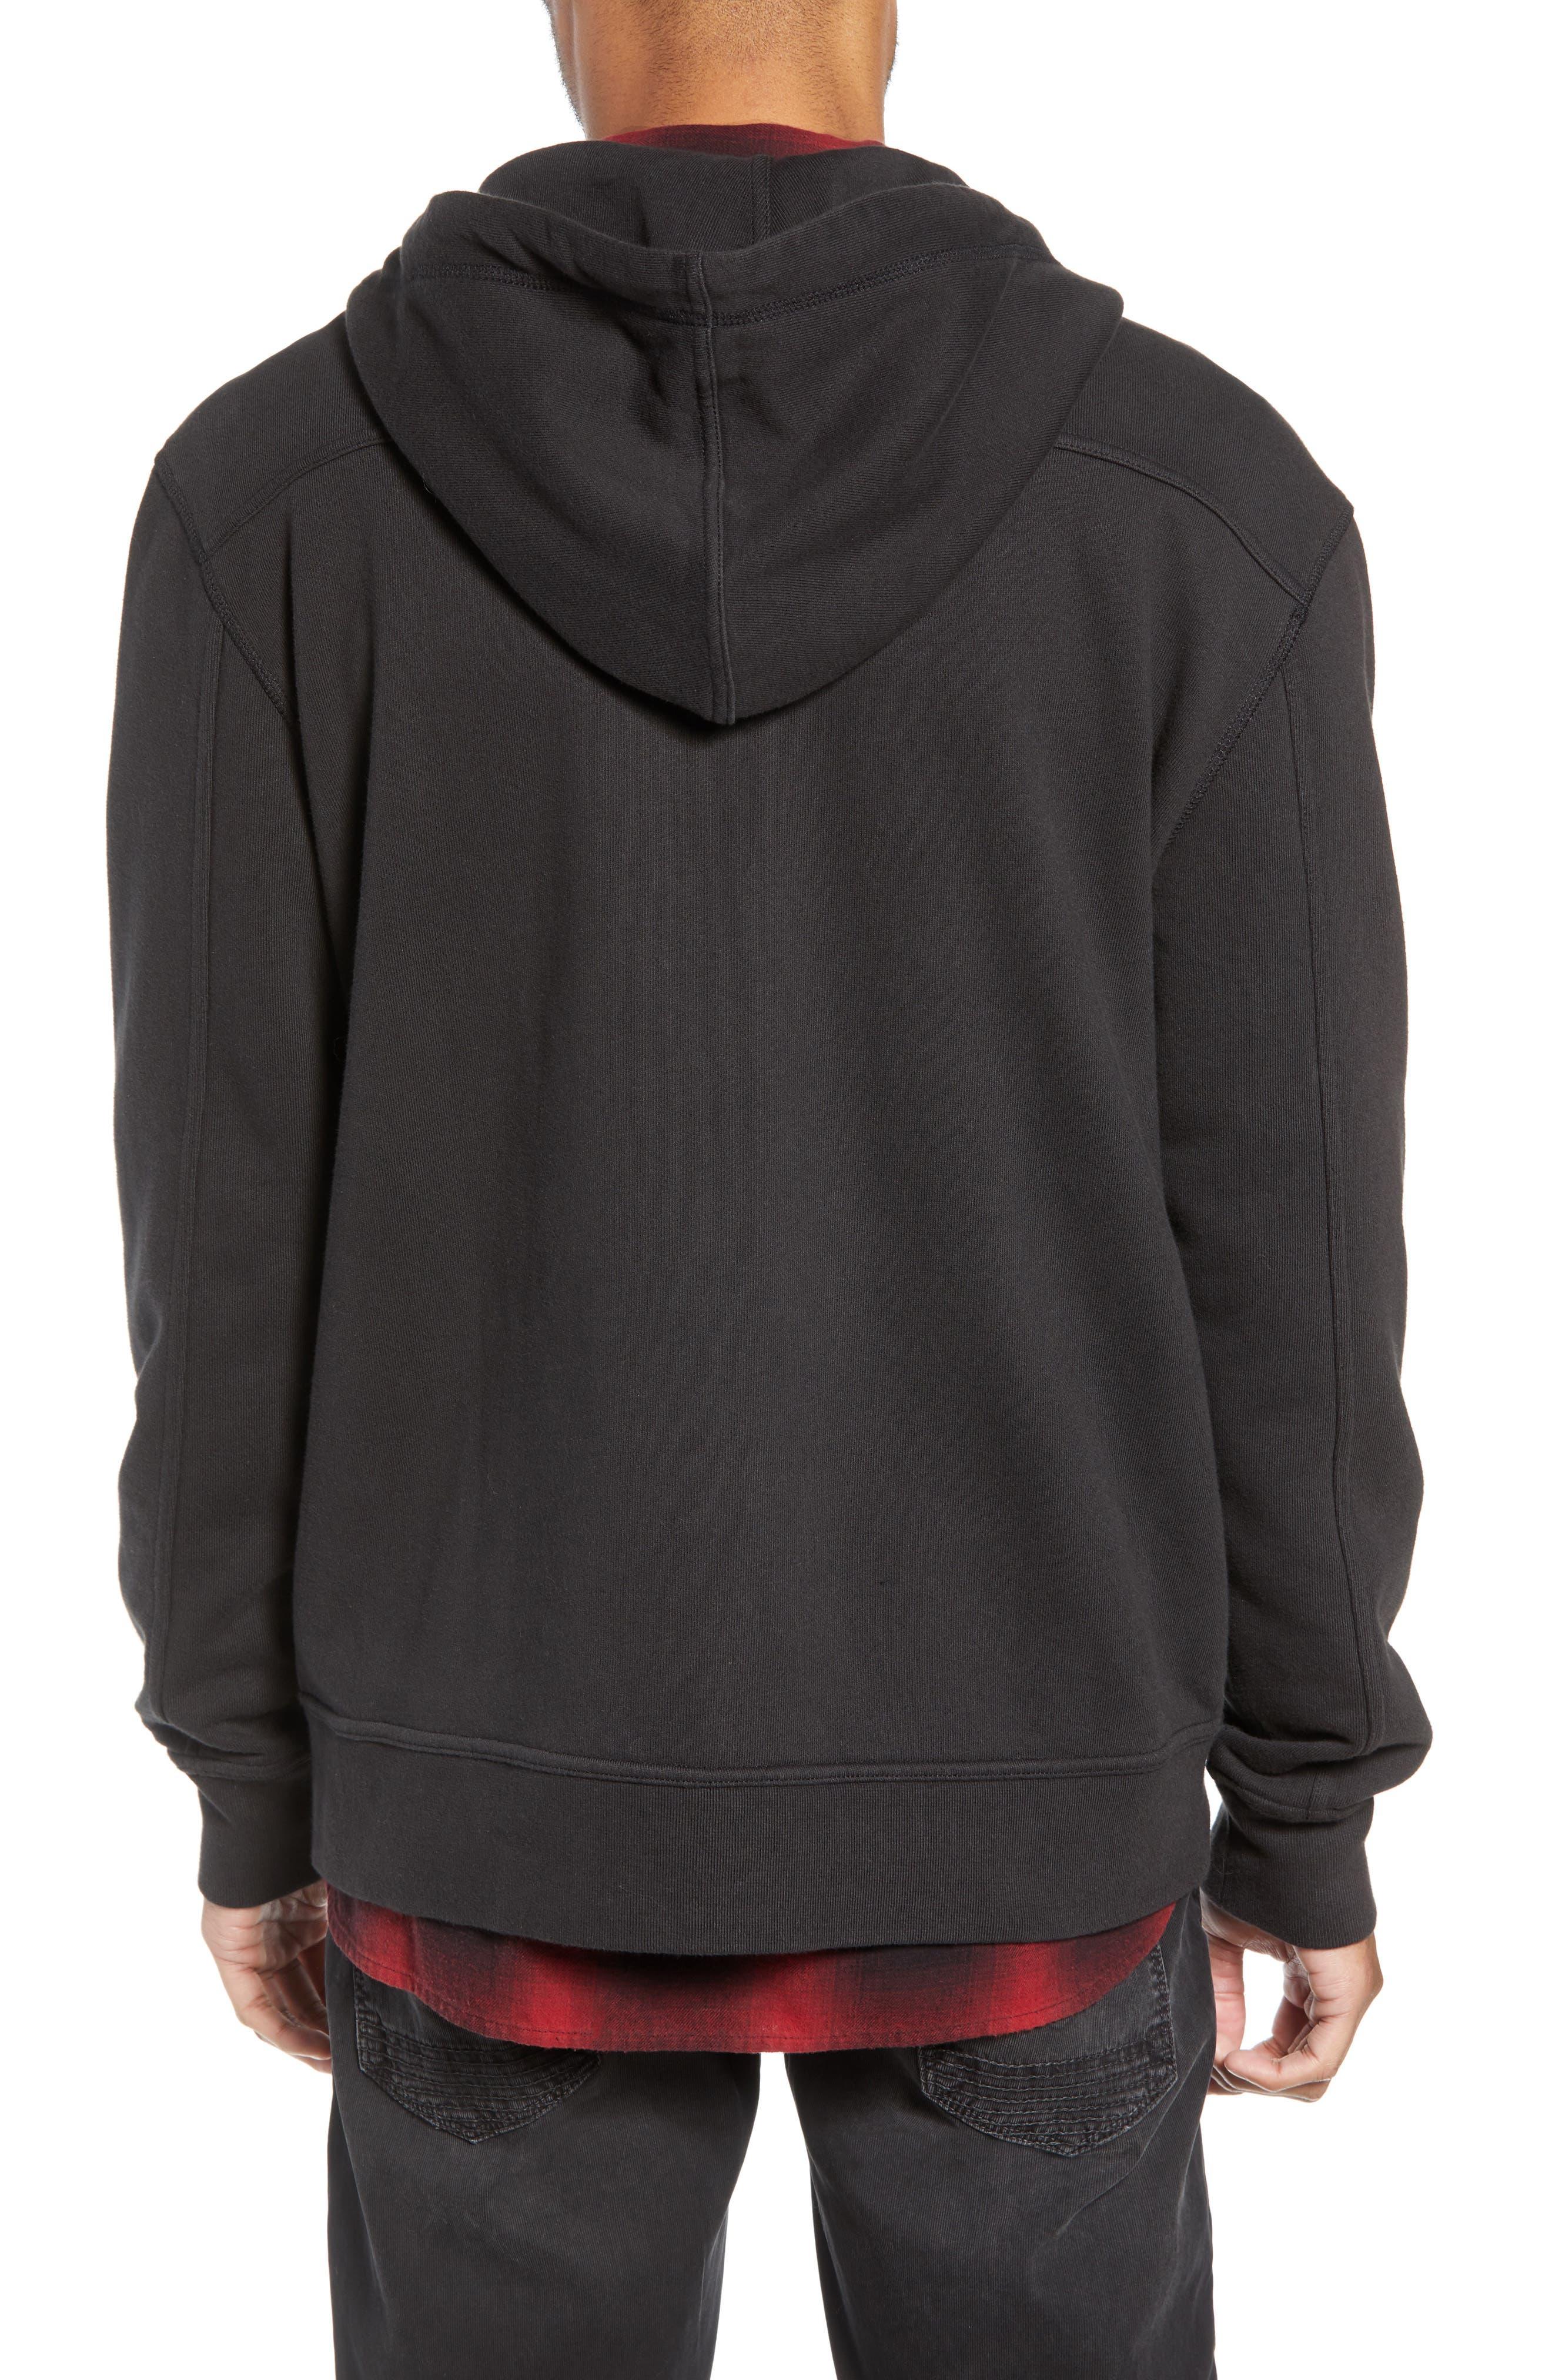 Regular Fit Hooded Zip Sweatshirt,                             Alternate thumbnail 2, color,                             001